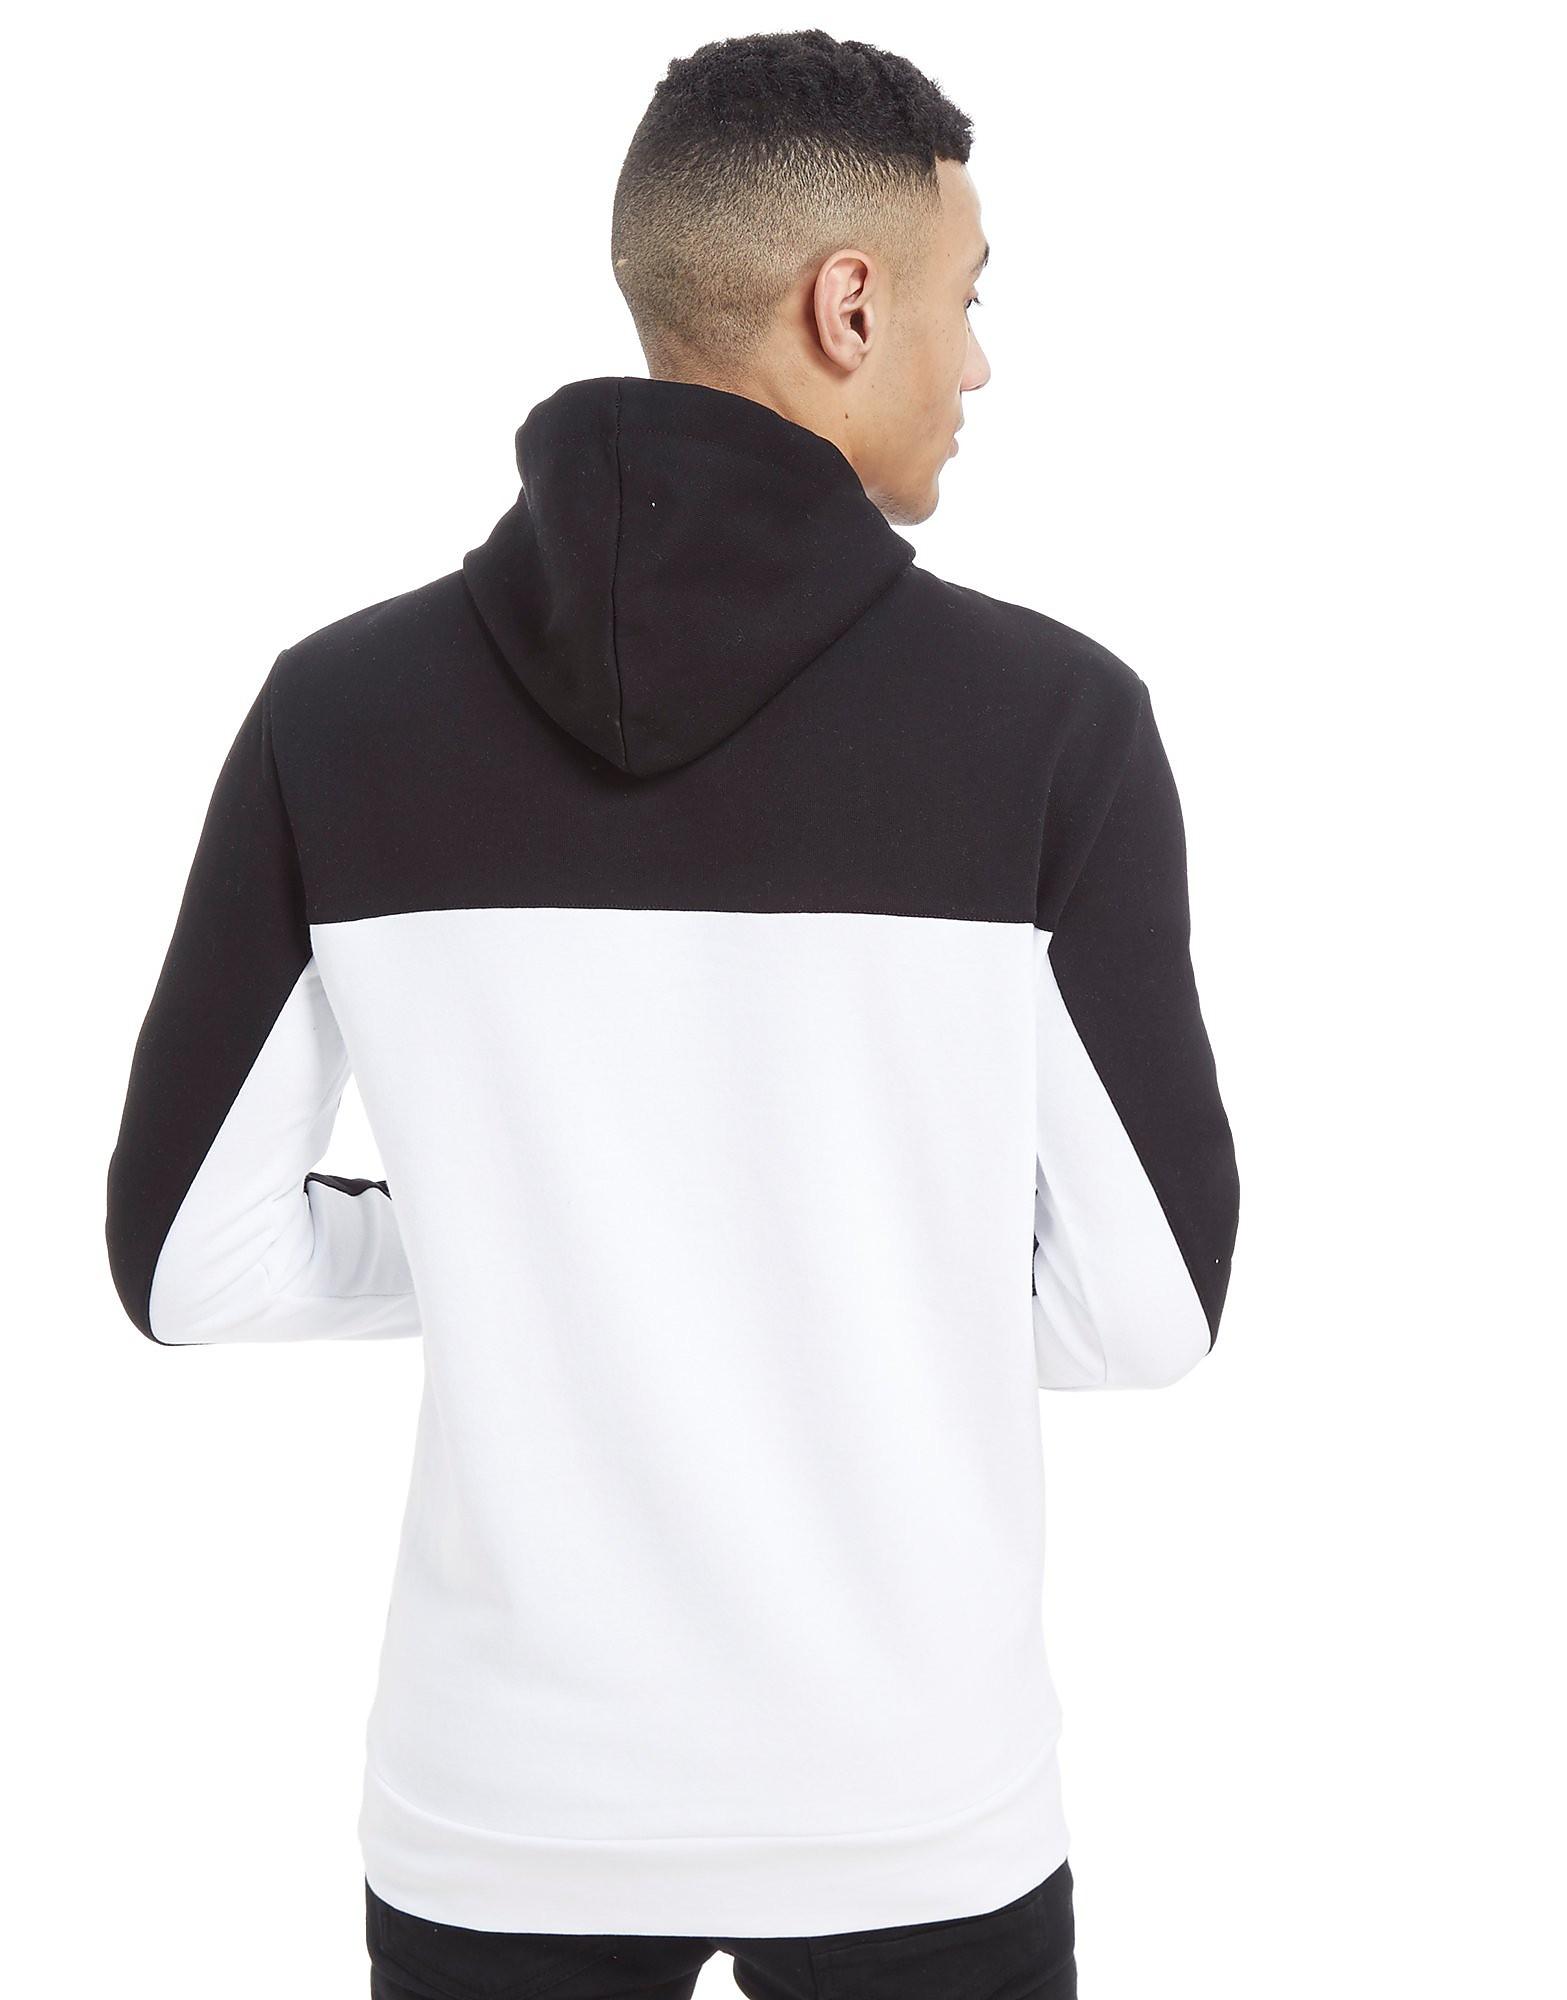 11 Degrees Colourblock Fleece Hoodie